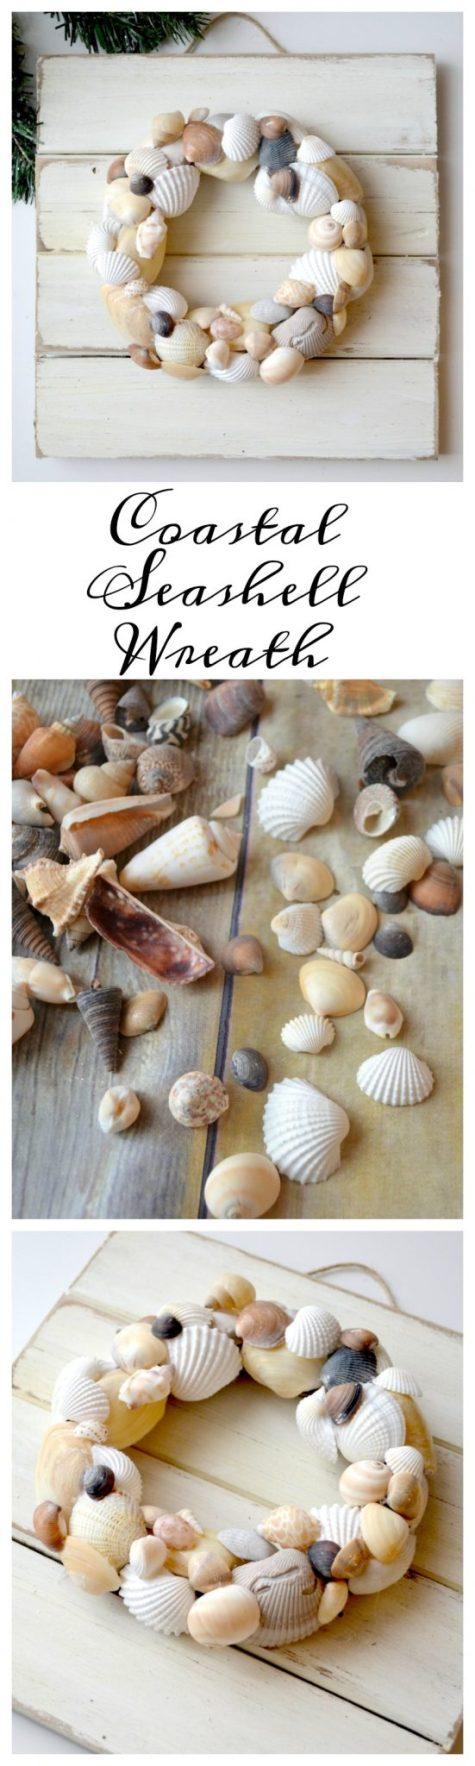 Coastal Seashell Wreath